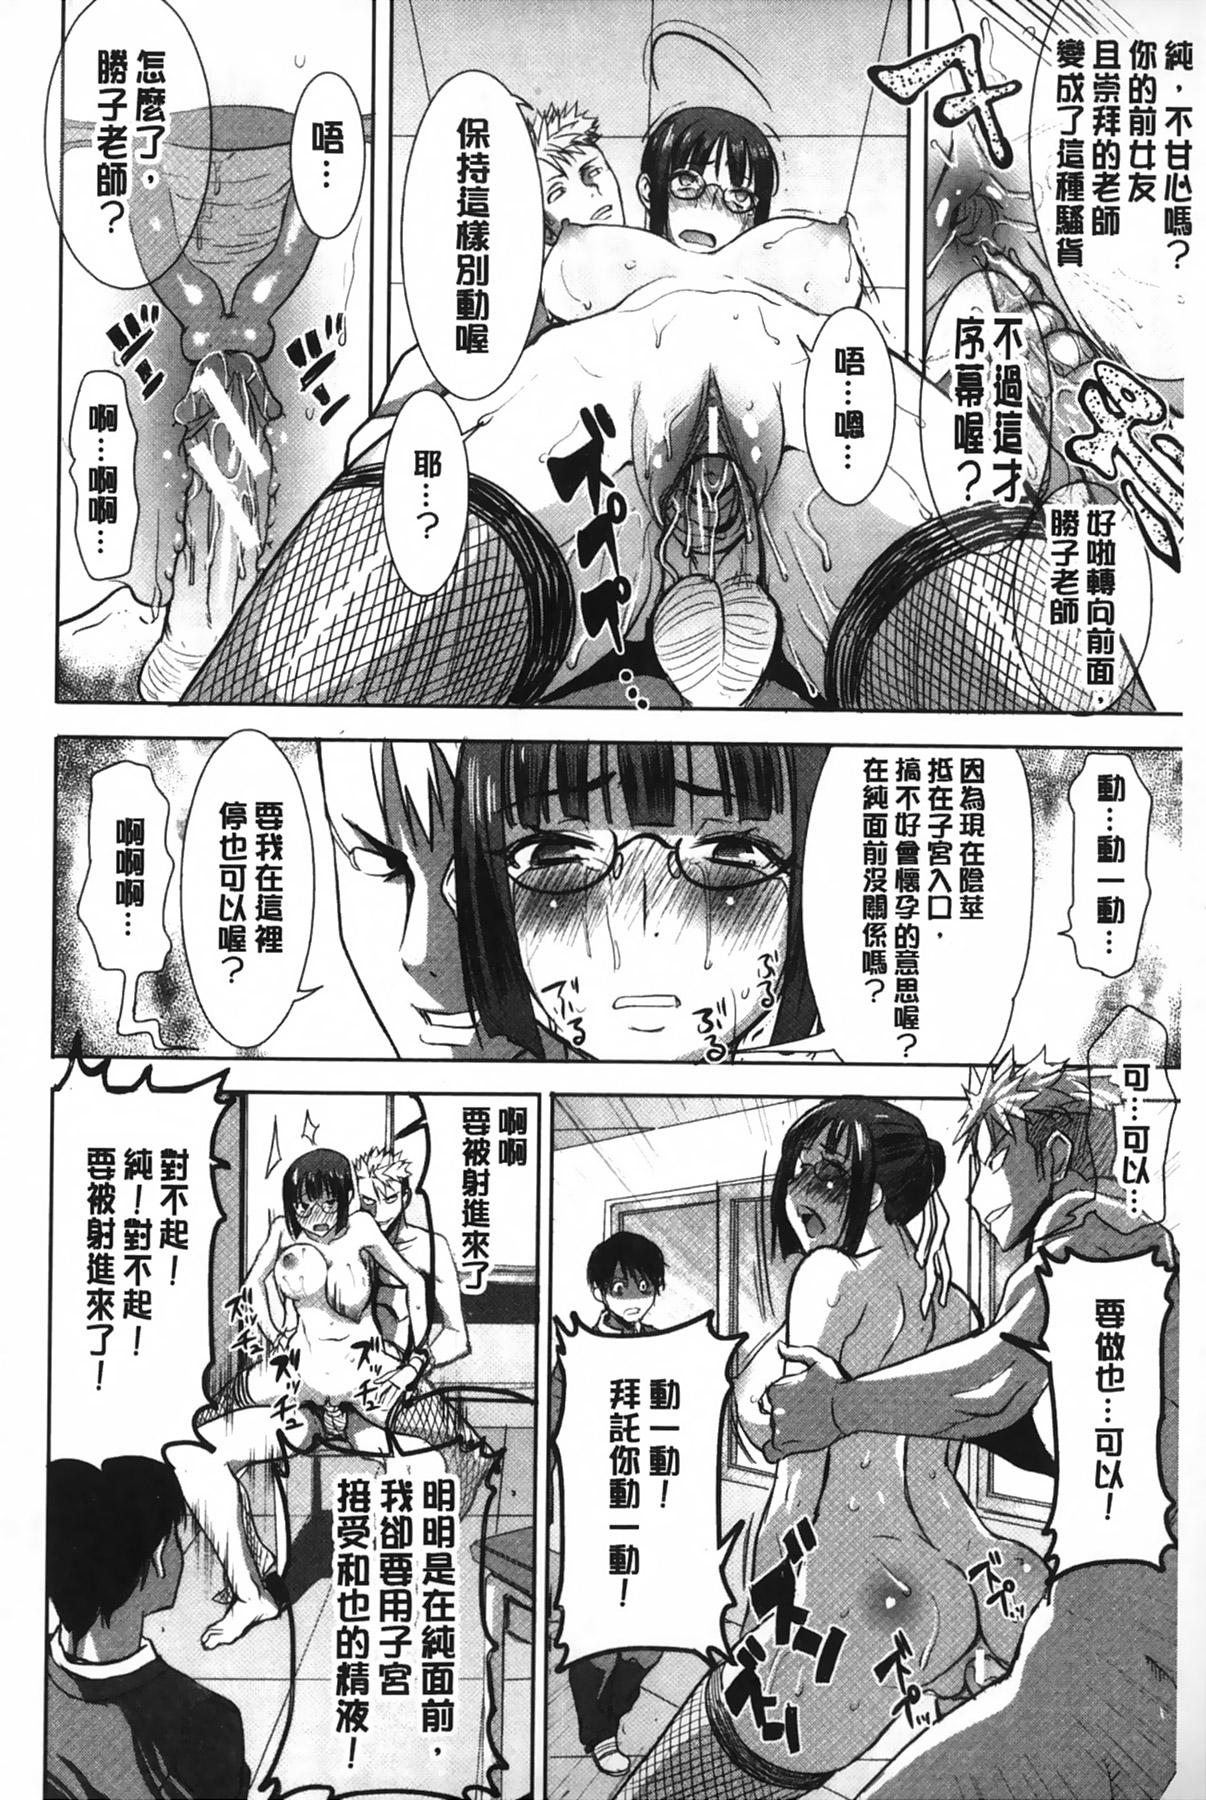 Ane Unsweet - Mihiragi Hiyori + | 姊姊不甜美 彌平木日和+ 156